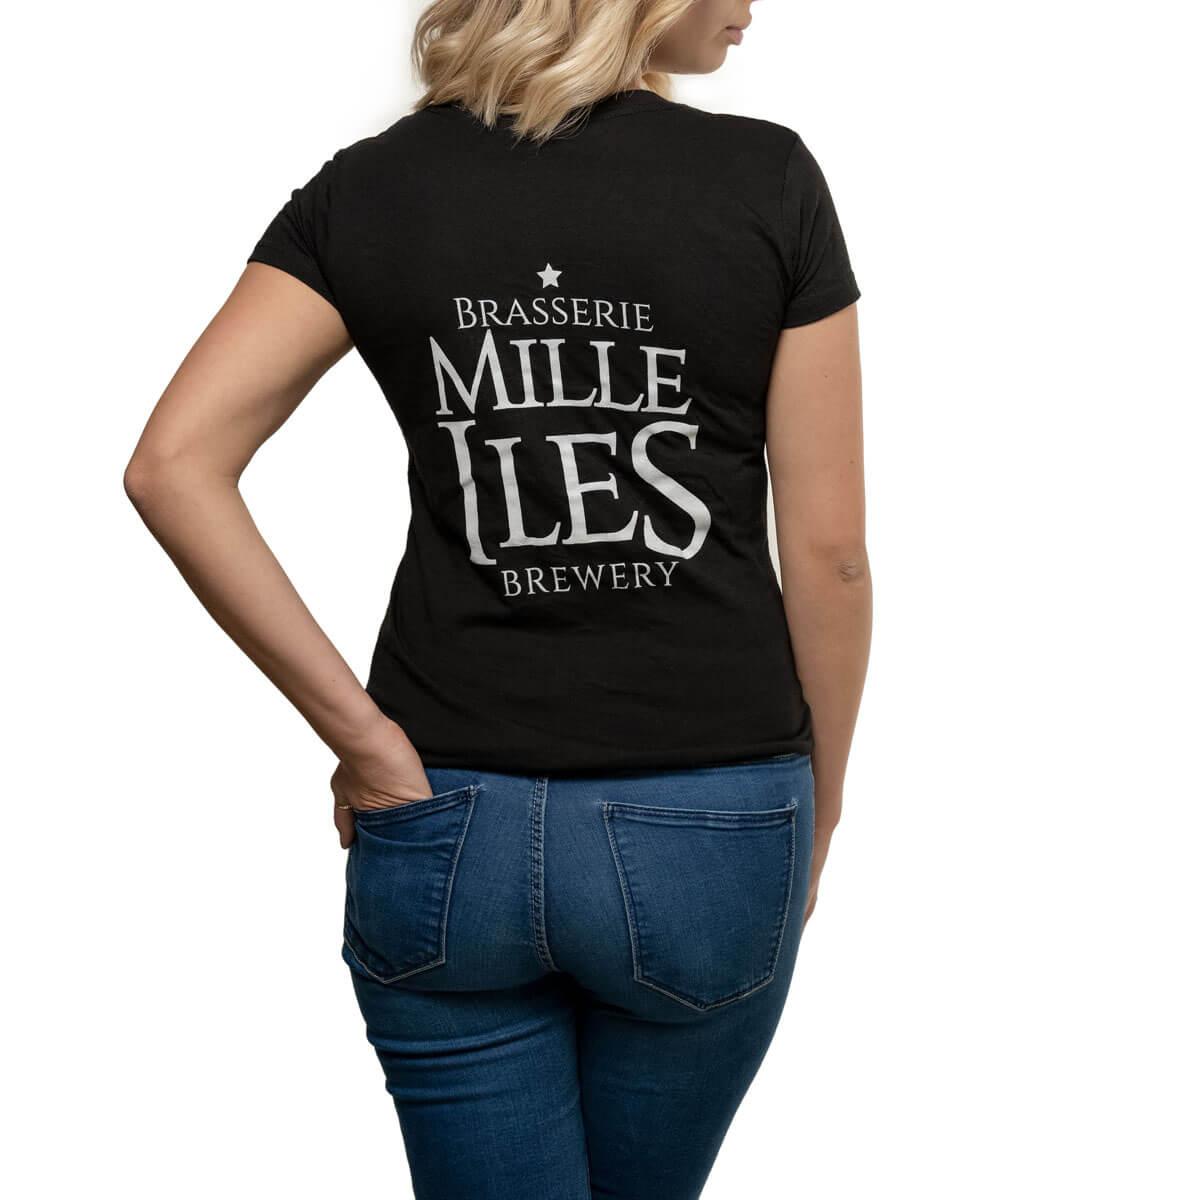 Chandail femme Brasserie Mille-iles